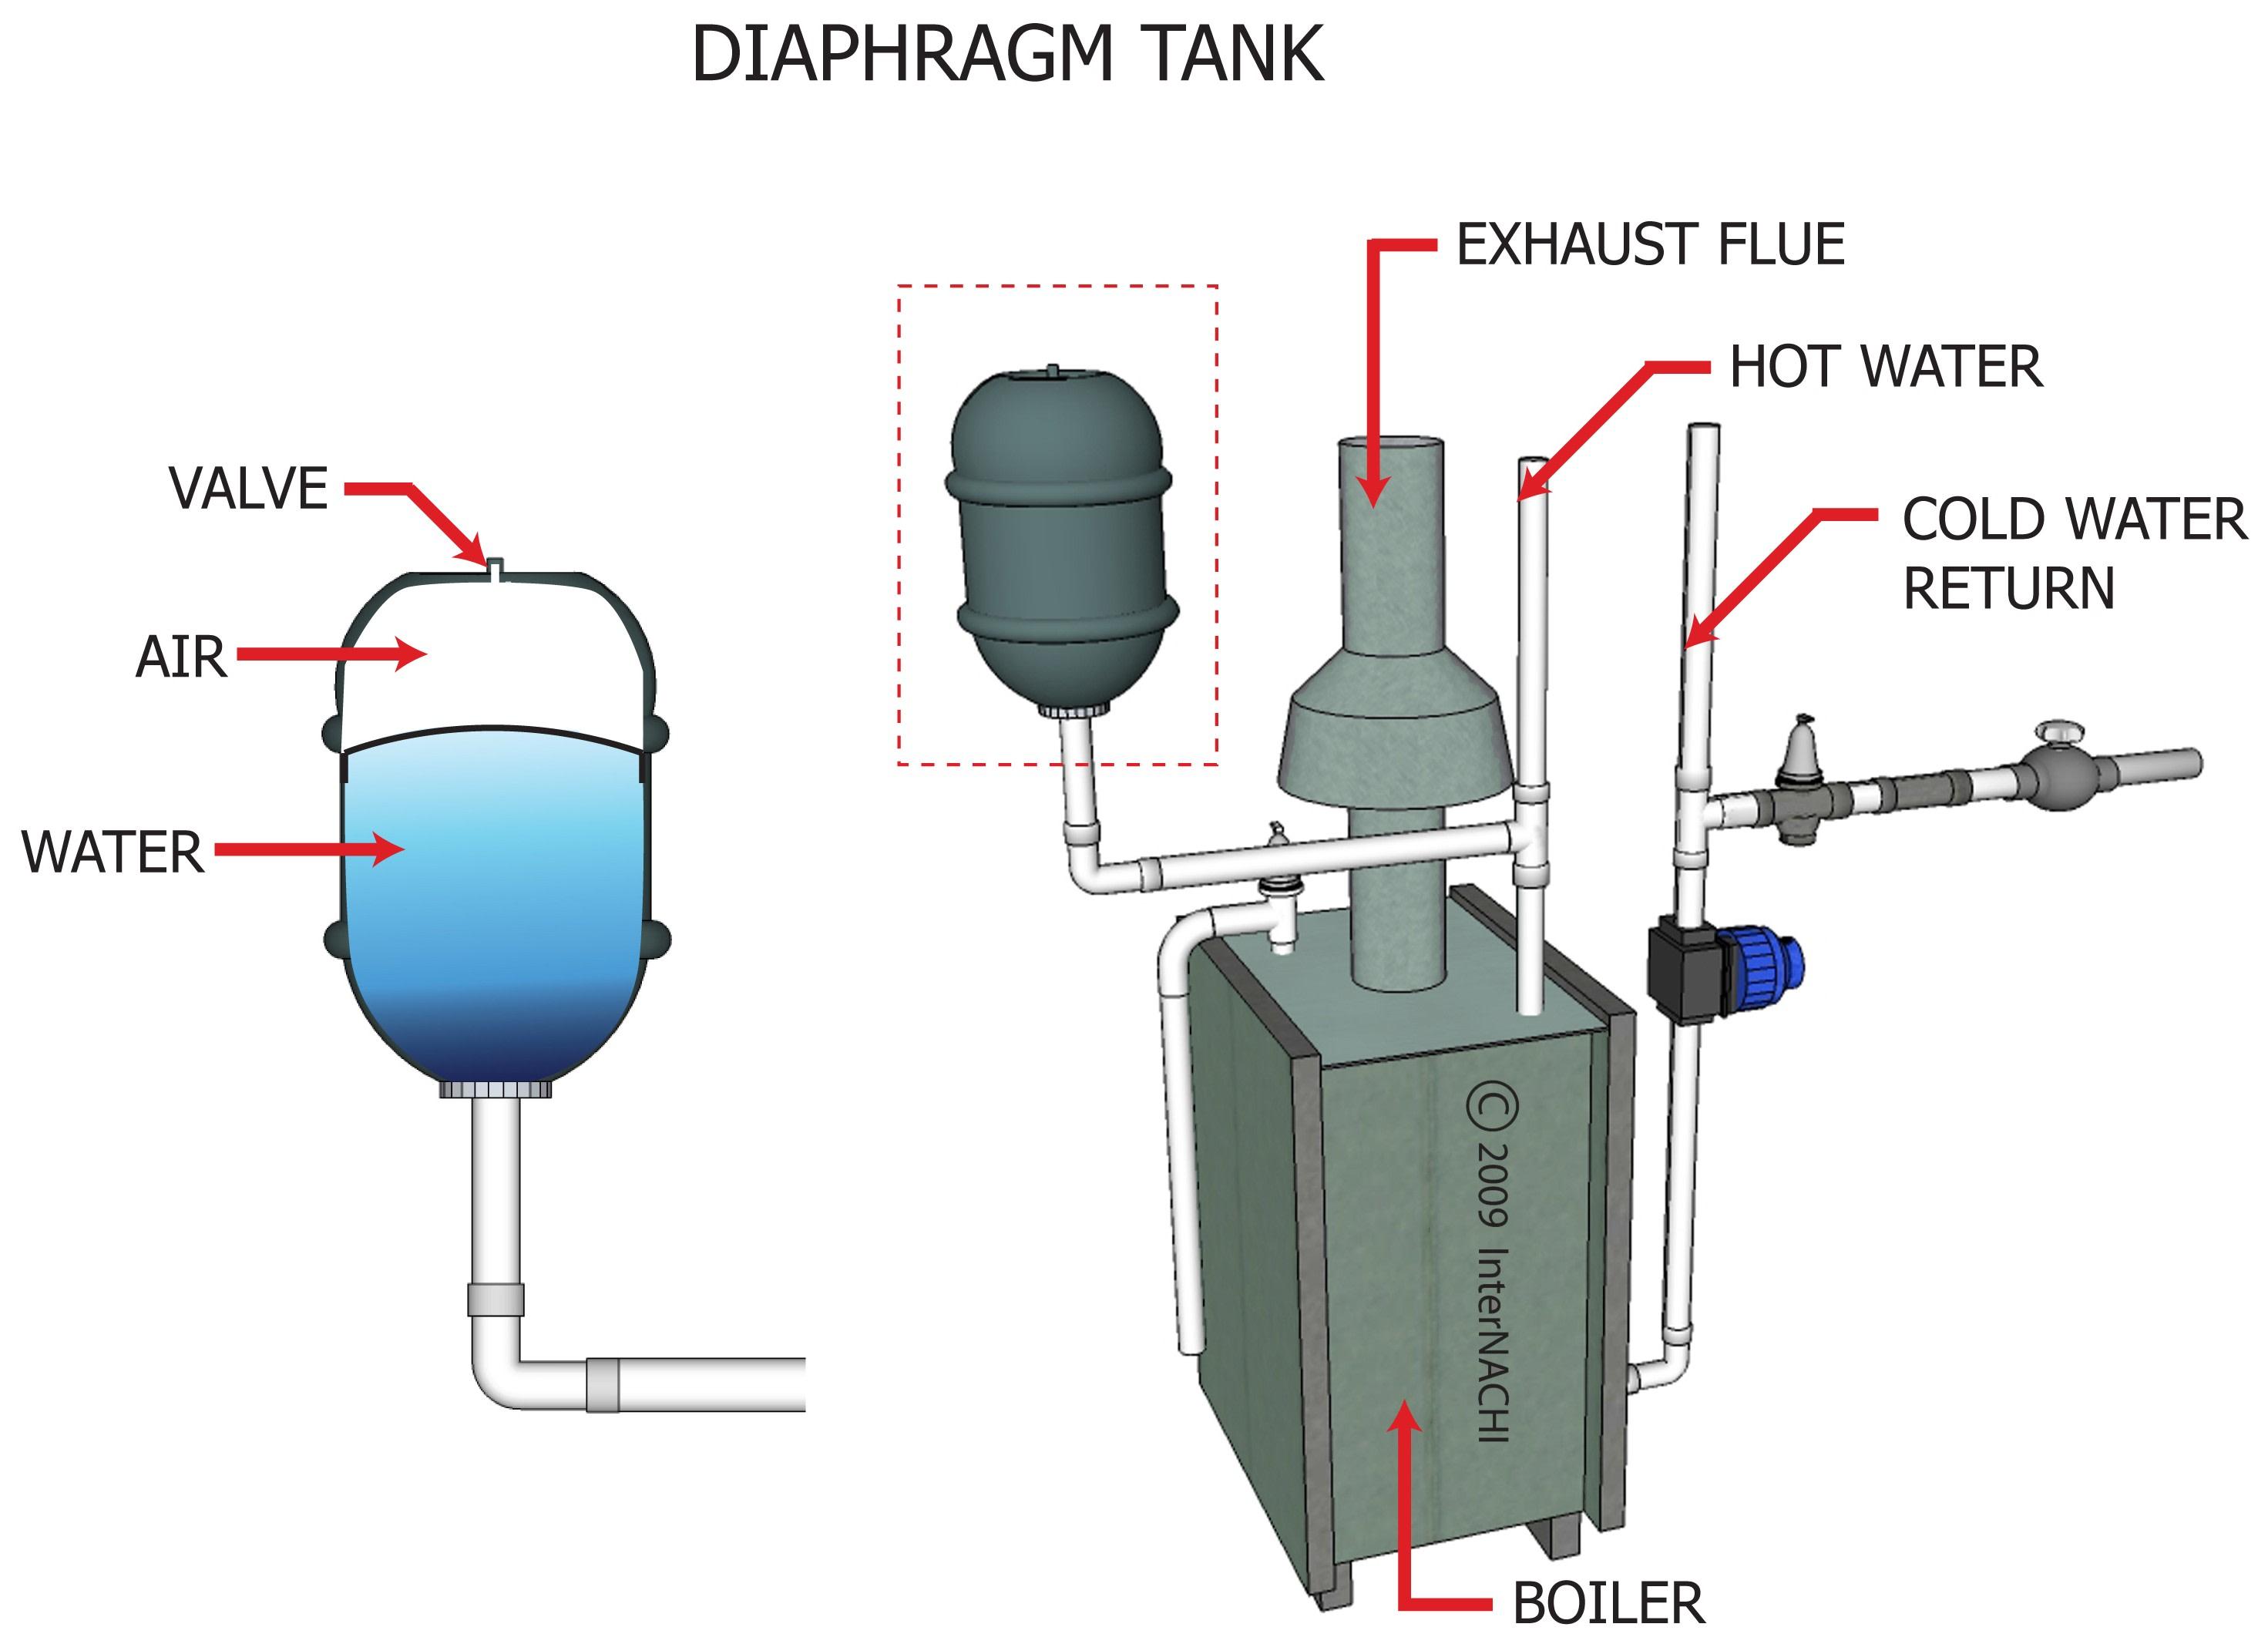 Diaphragm tank.